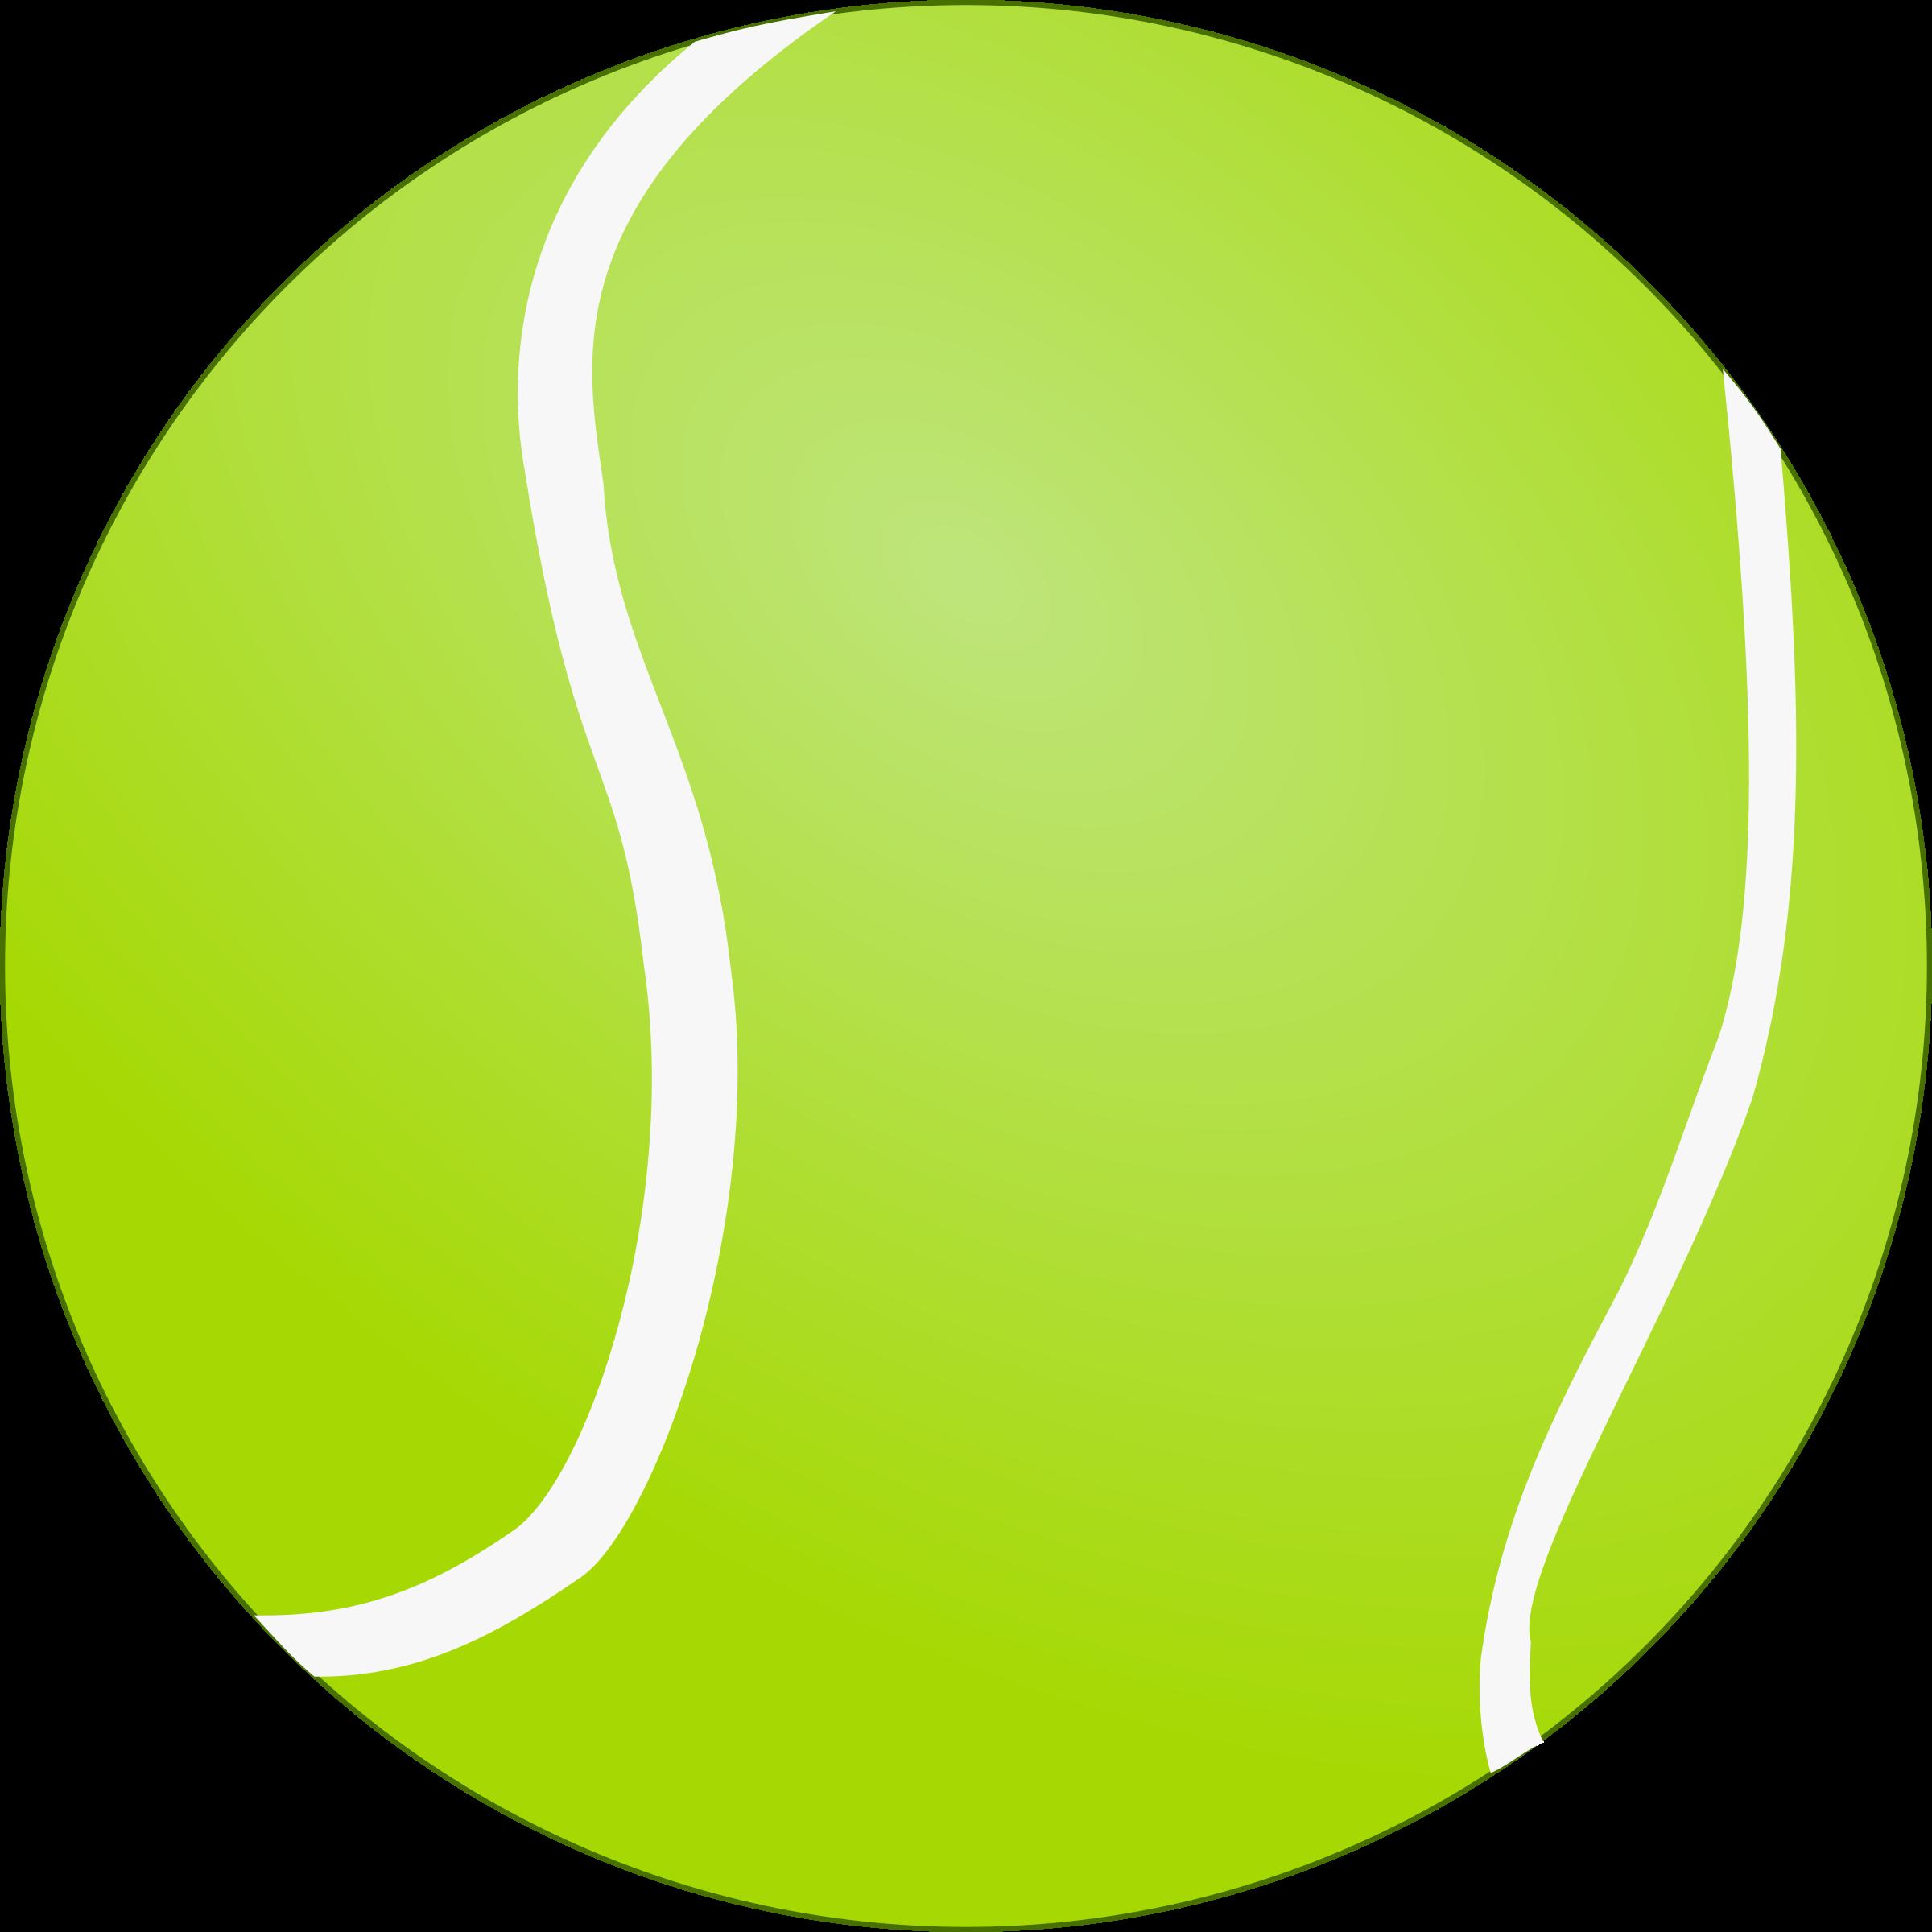 Tennis bola de tenis. Picture clipart ball